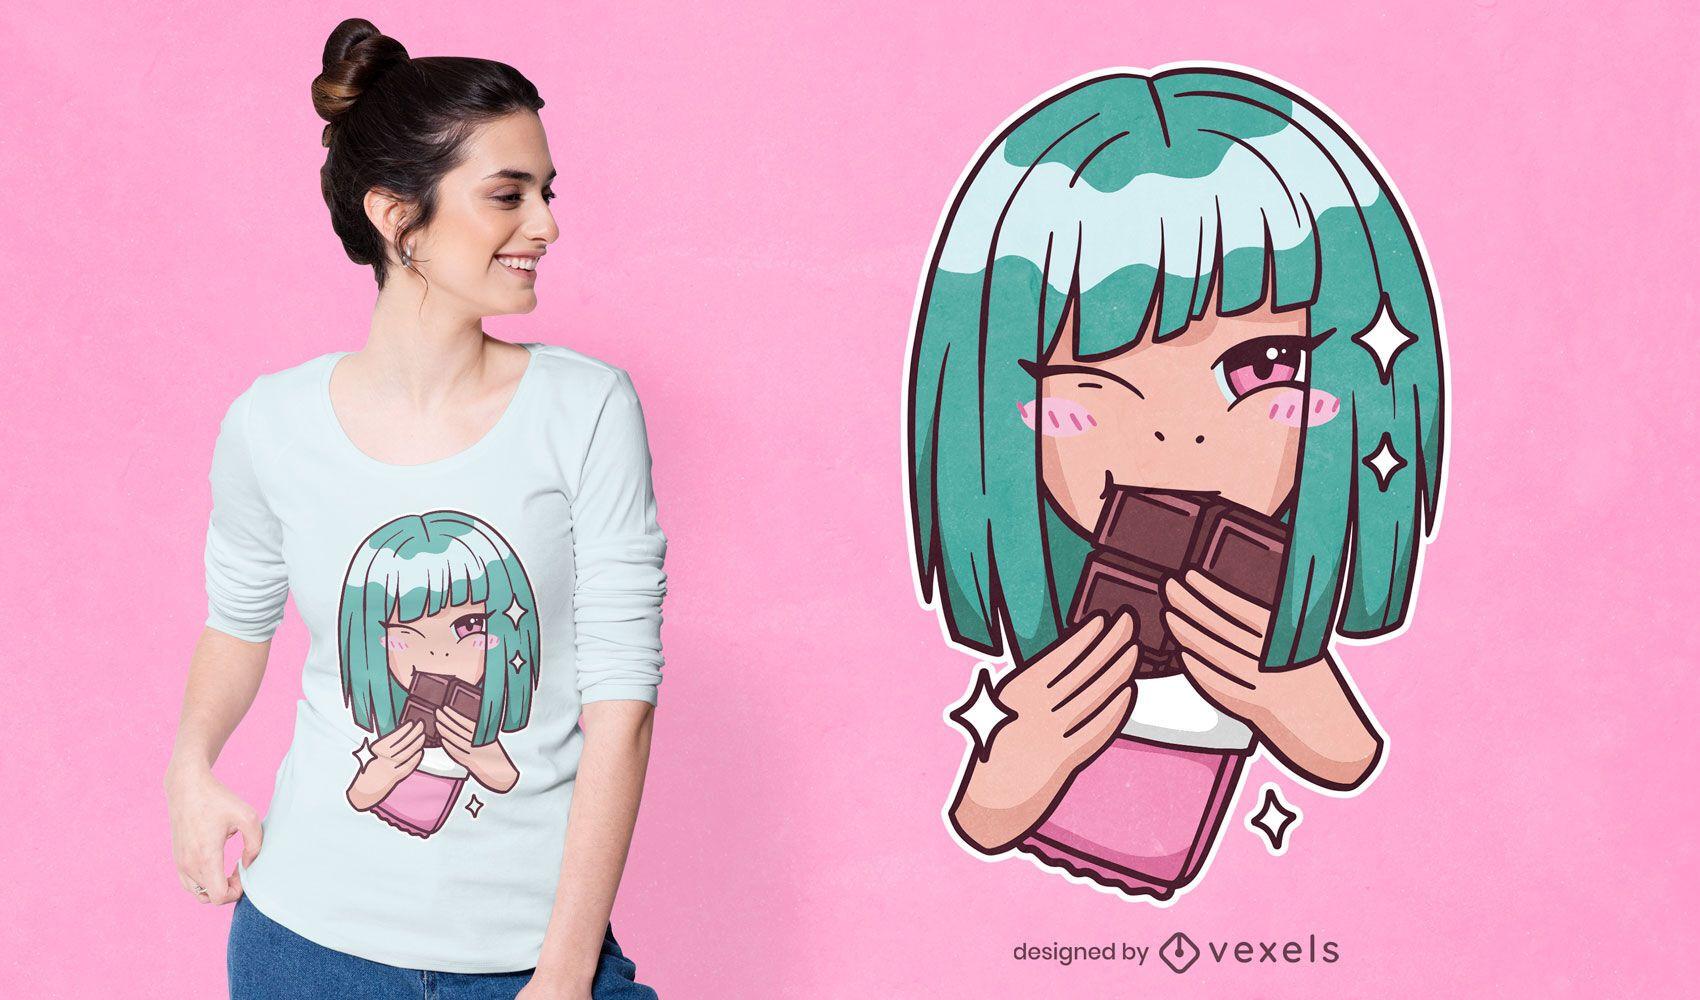 Chocolate anime girl t-shirt design